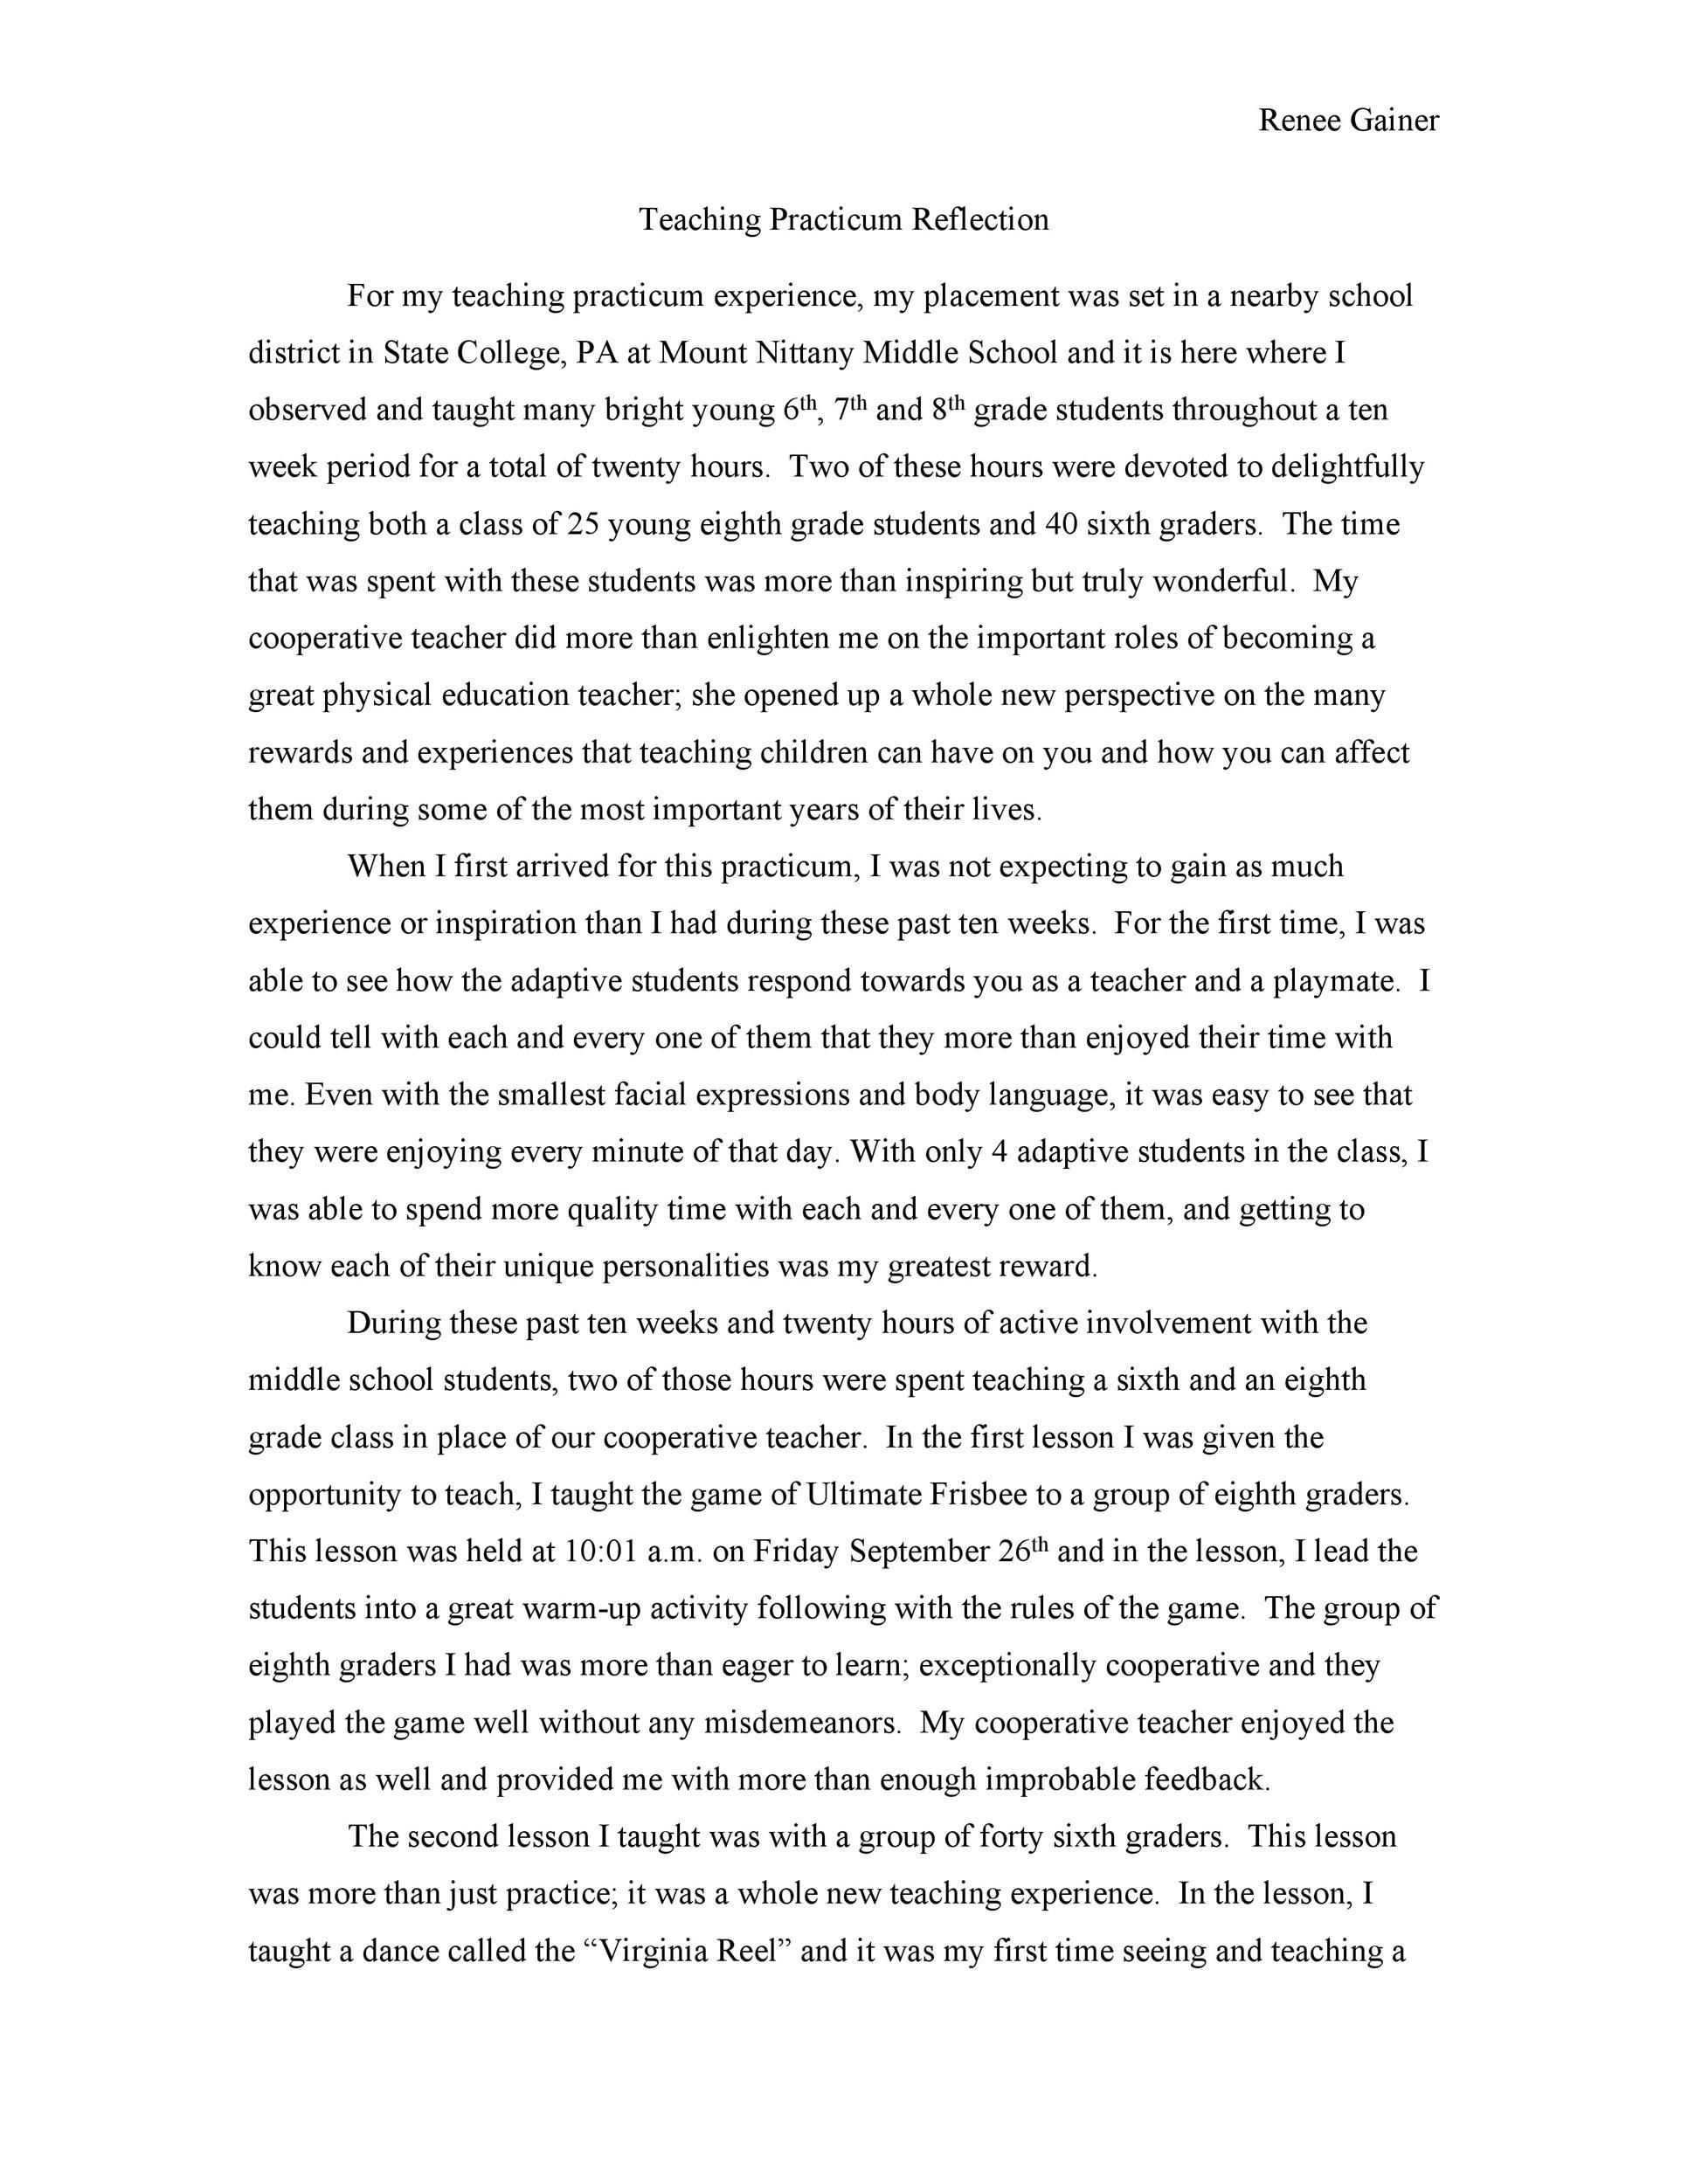 Free reflective essay example 28